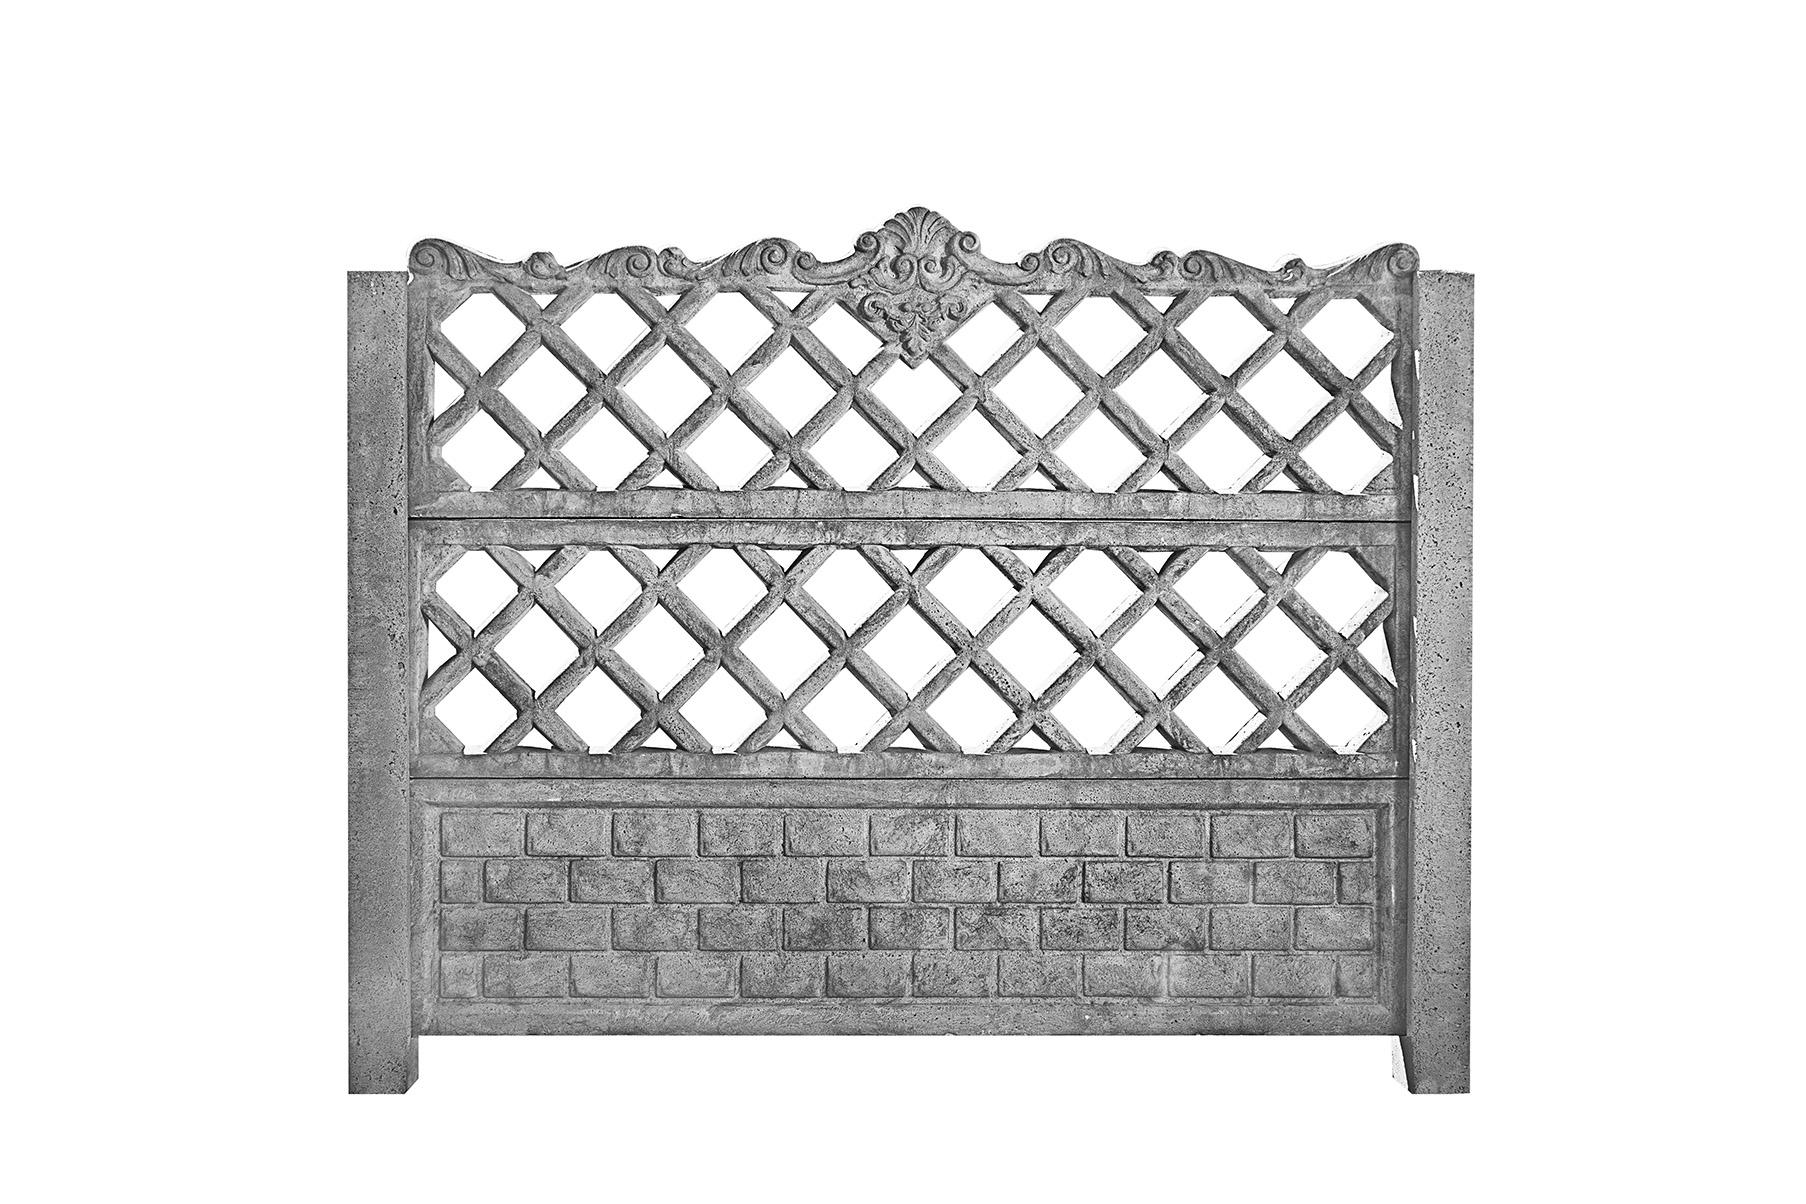 betónové ploty číslo modelu 19